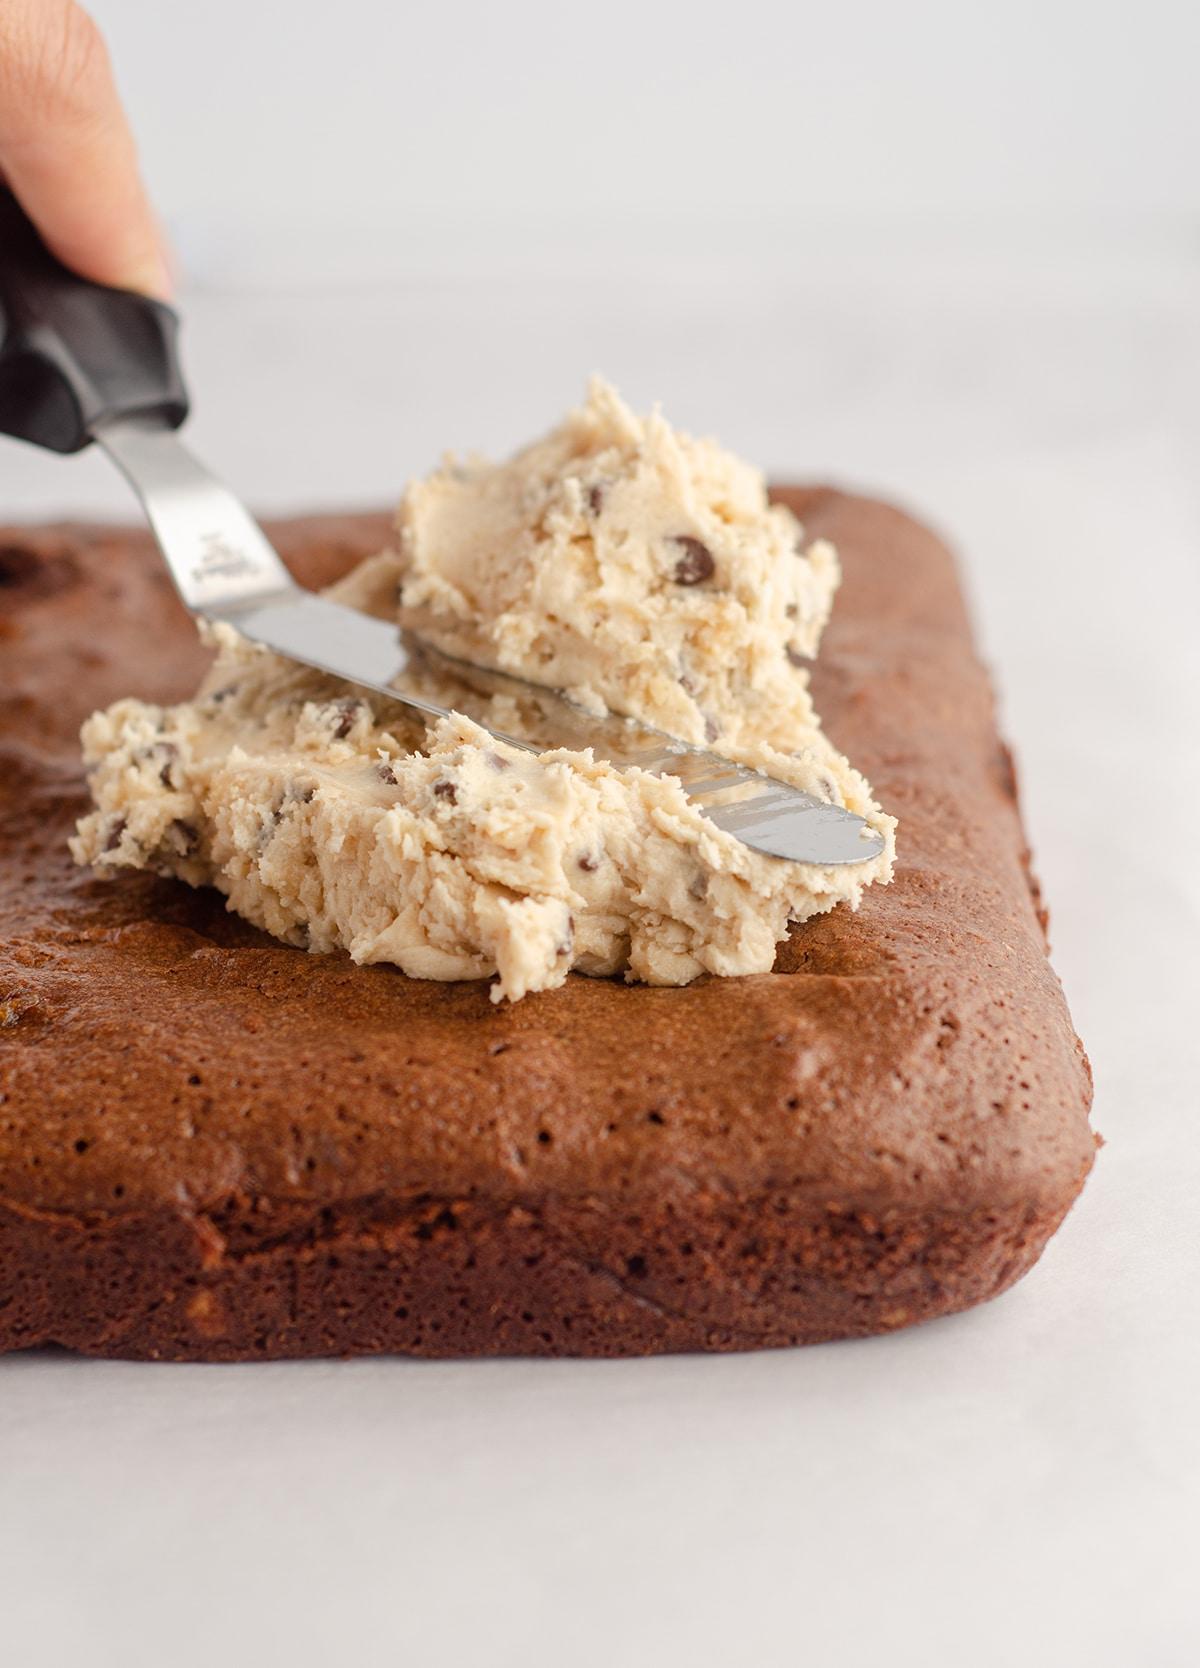 spatula spreading cookie dough buttercream onto brownies